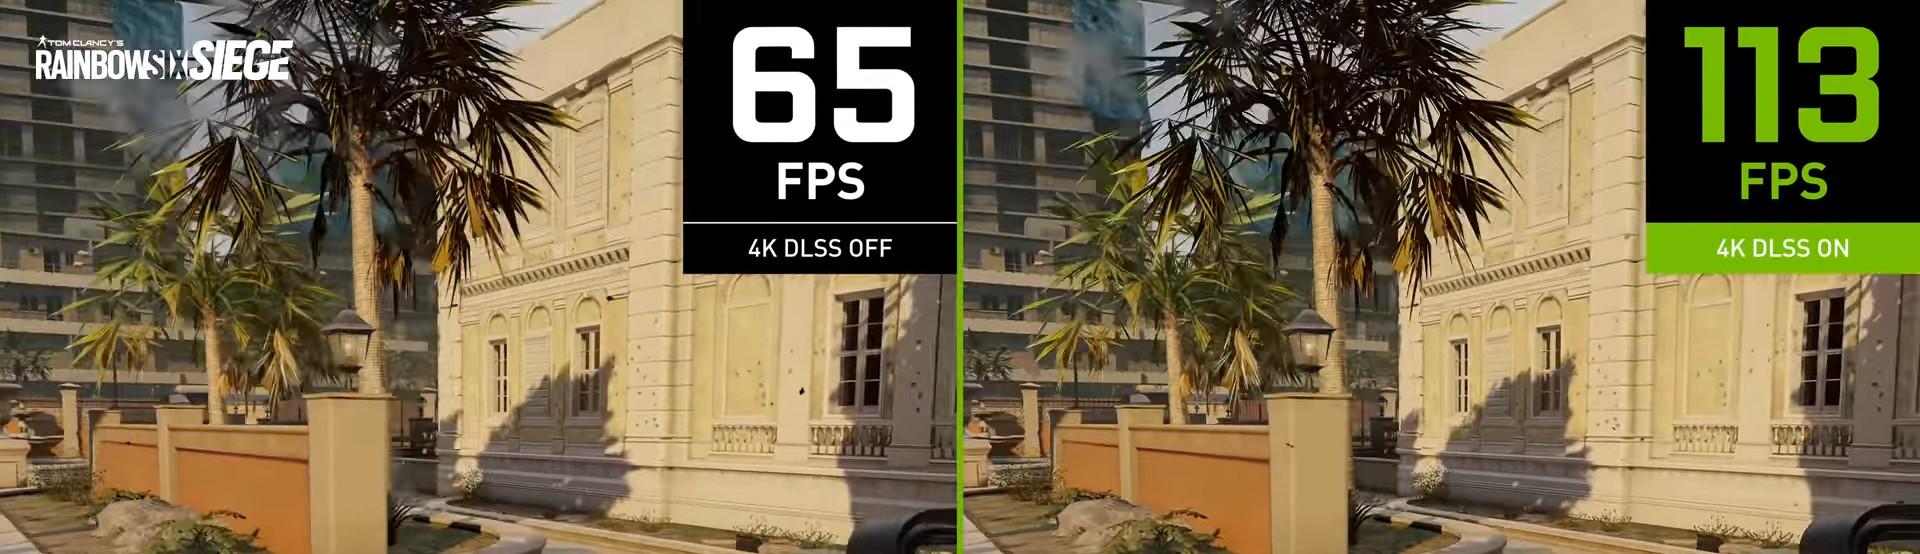 Nvidia добавила поддержку DLSS 2.2 в Rainbow Six Siege / Новости / Overclockers.ua